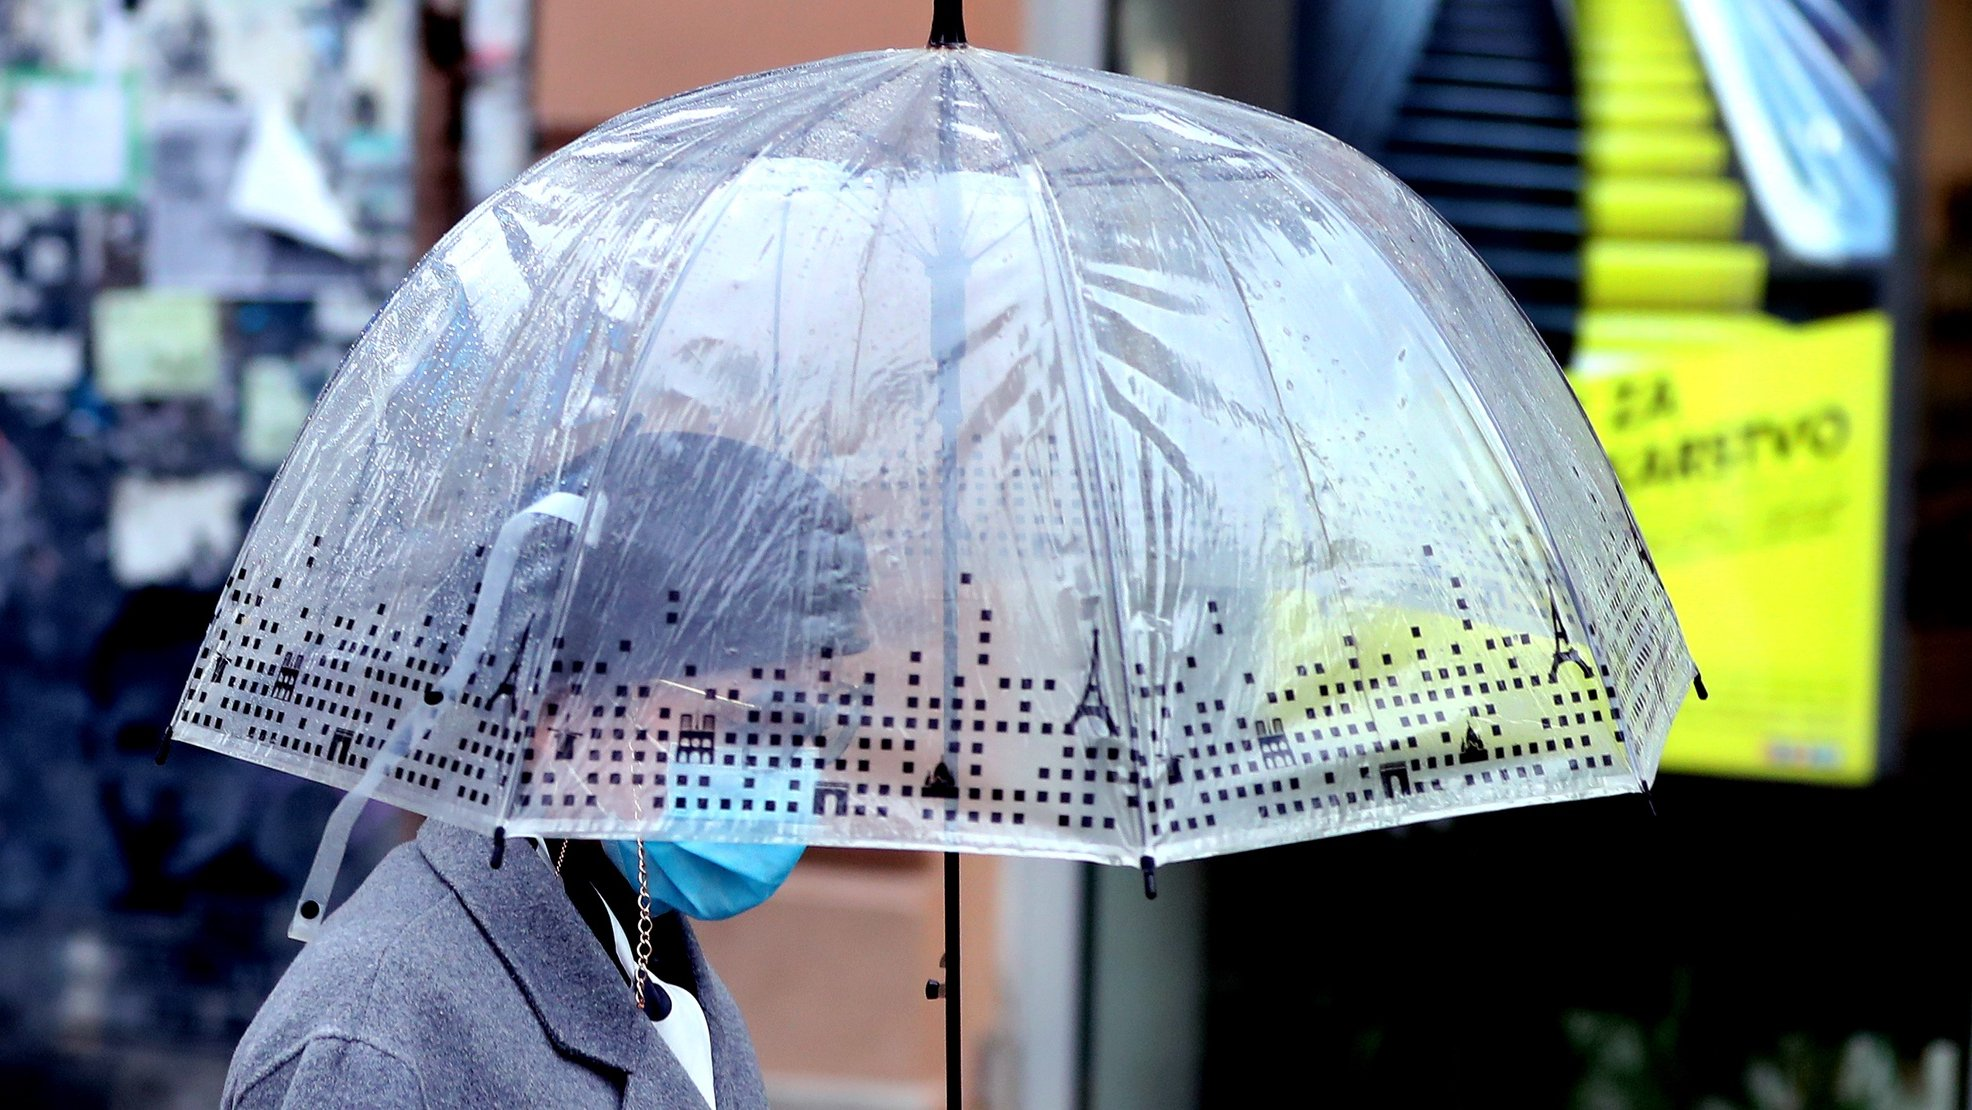 epa08830893 A woman wearing face mask walks holding an umbrella during rain in Sarajevo, Bosnia and Herzegovina, 20 November 2020.  EPA/FEHIM DEMIR